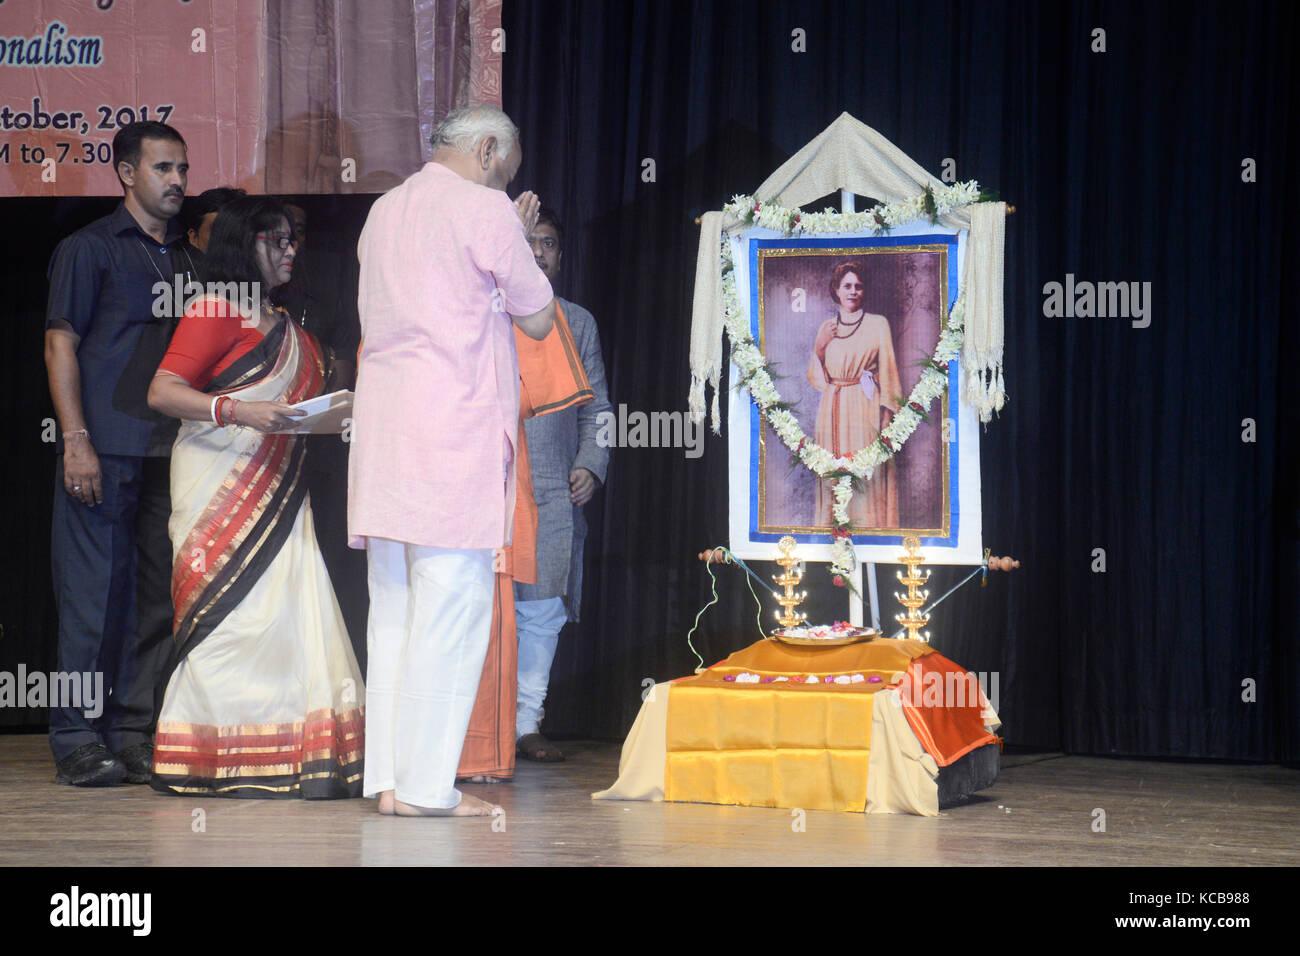 Kolkata, India. 03rd Oct, 2017. Mohan Rao Bhagwat pays tribute to Sister Nivedita in Kolkata.Sarasanghachalak or - Stock Image